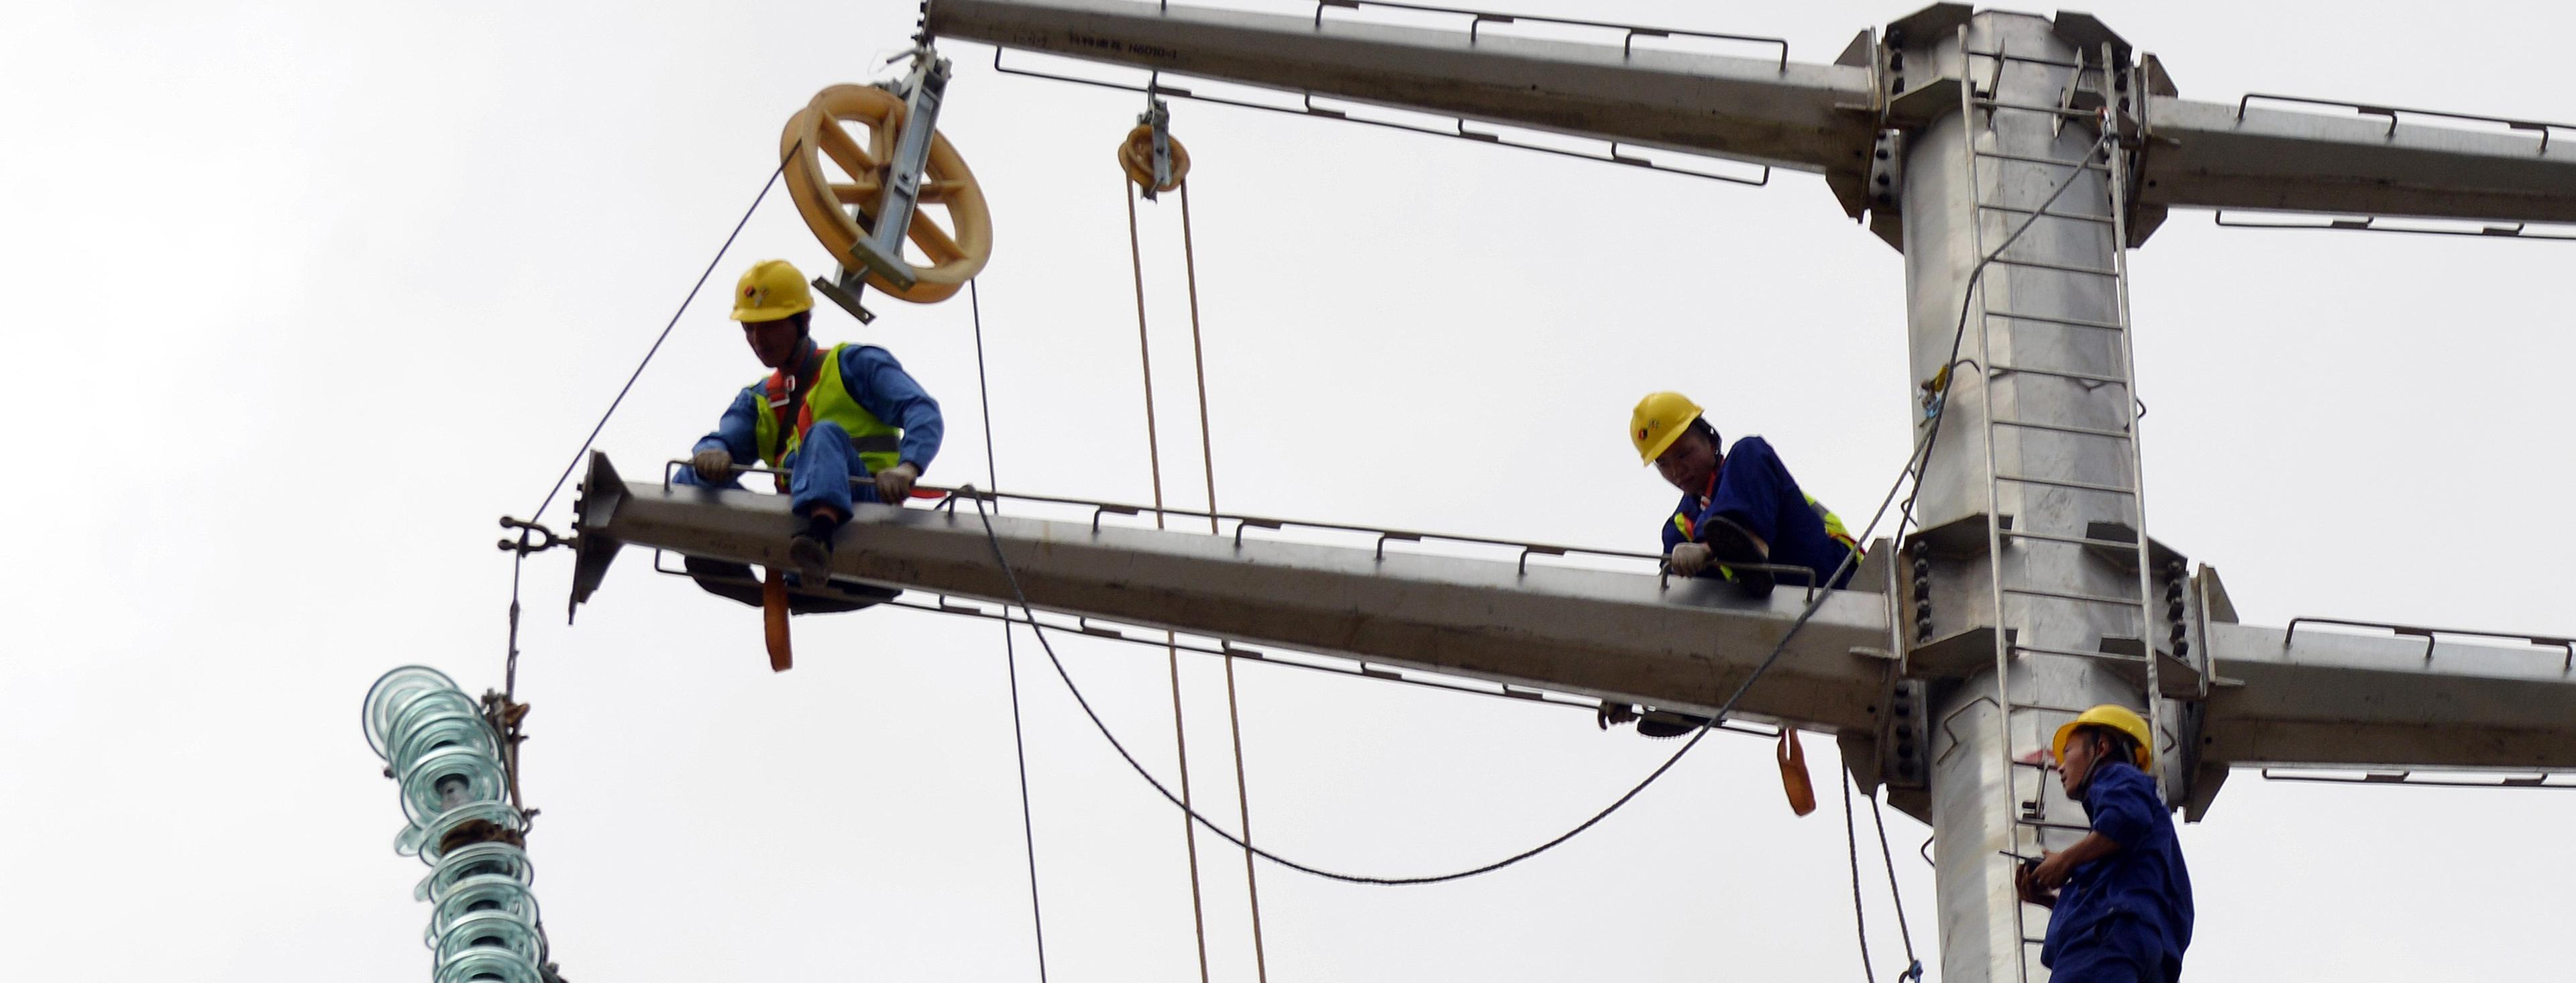 ICOAST-CHINA-ELECTRICITY-CONSTRUCTION